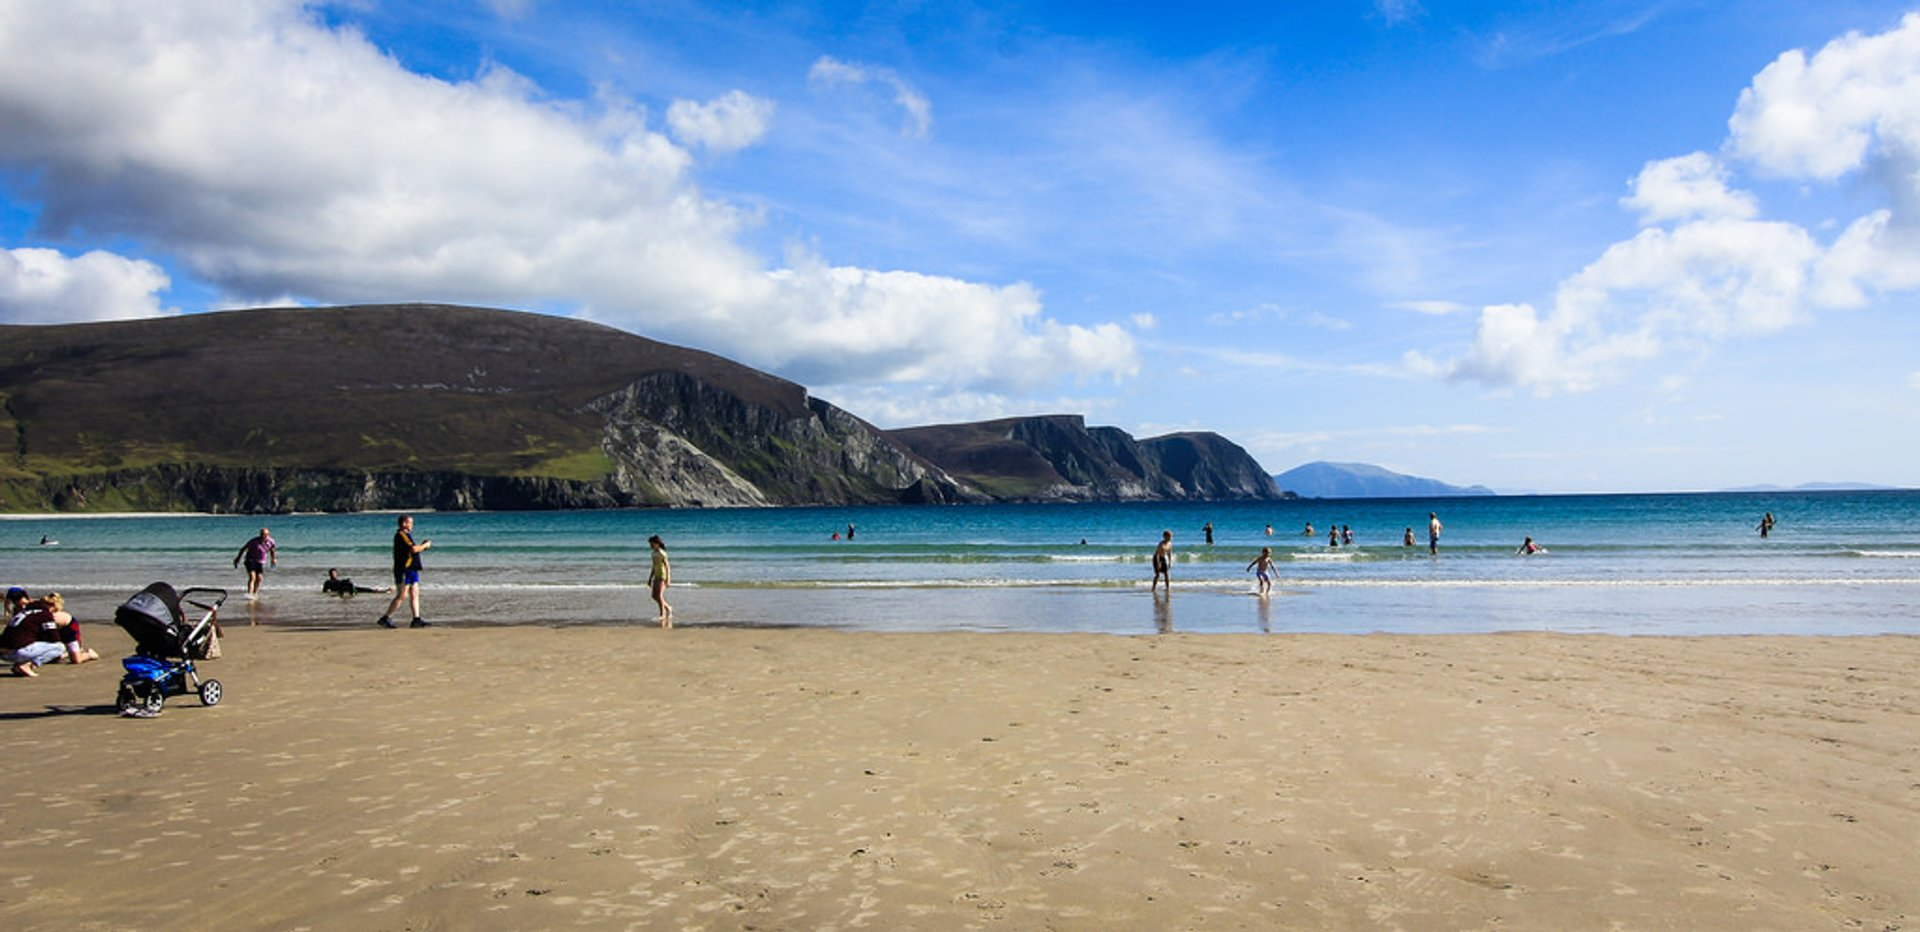 Summer in Ireland - Best Season 2020